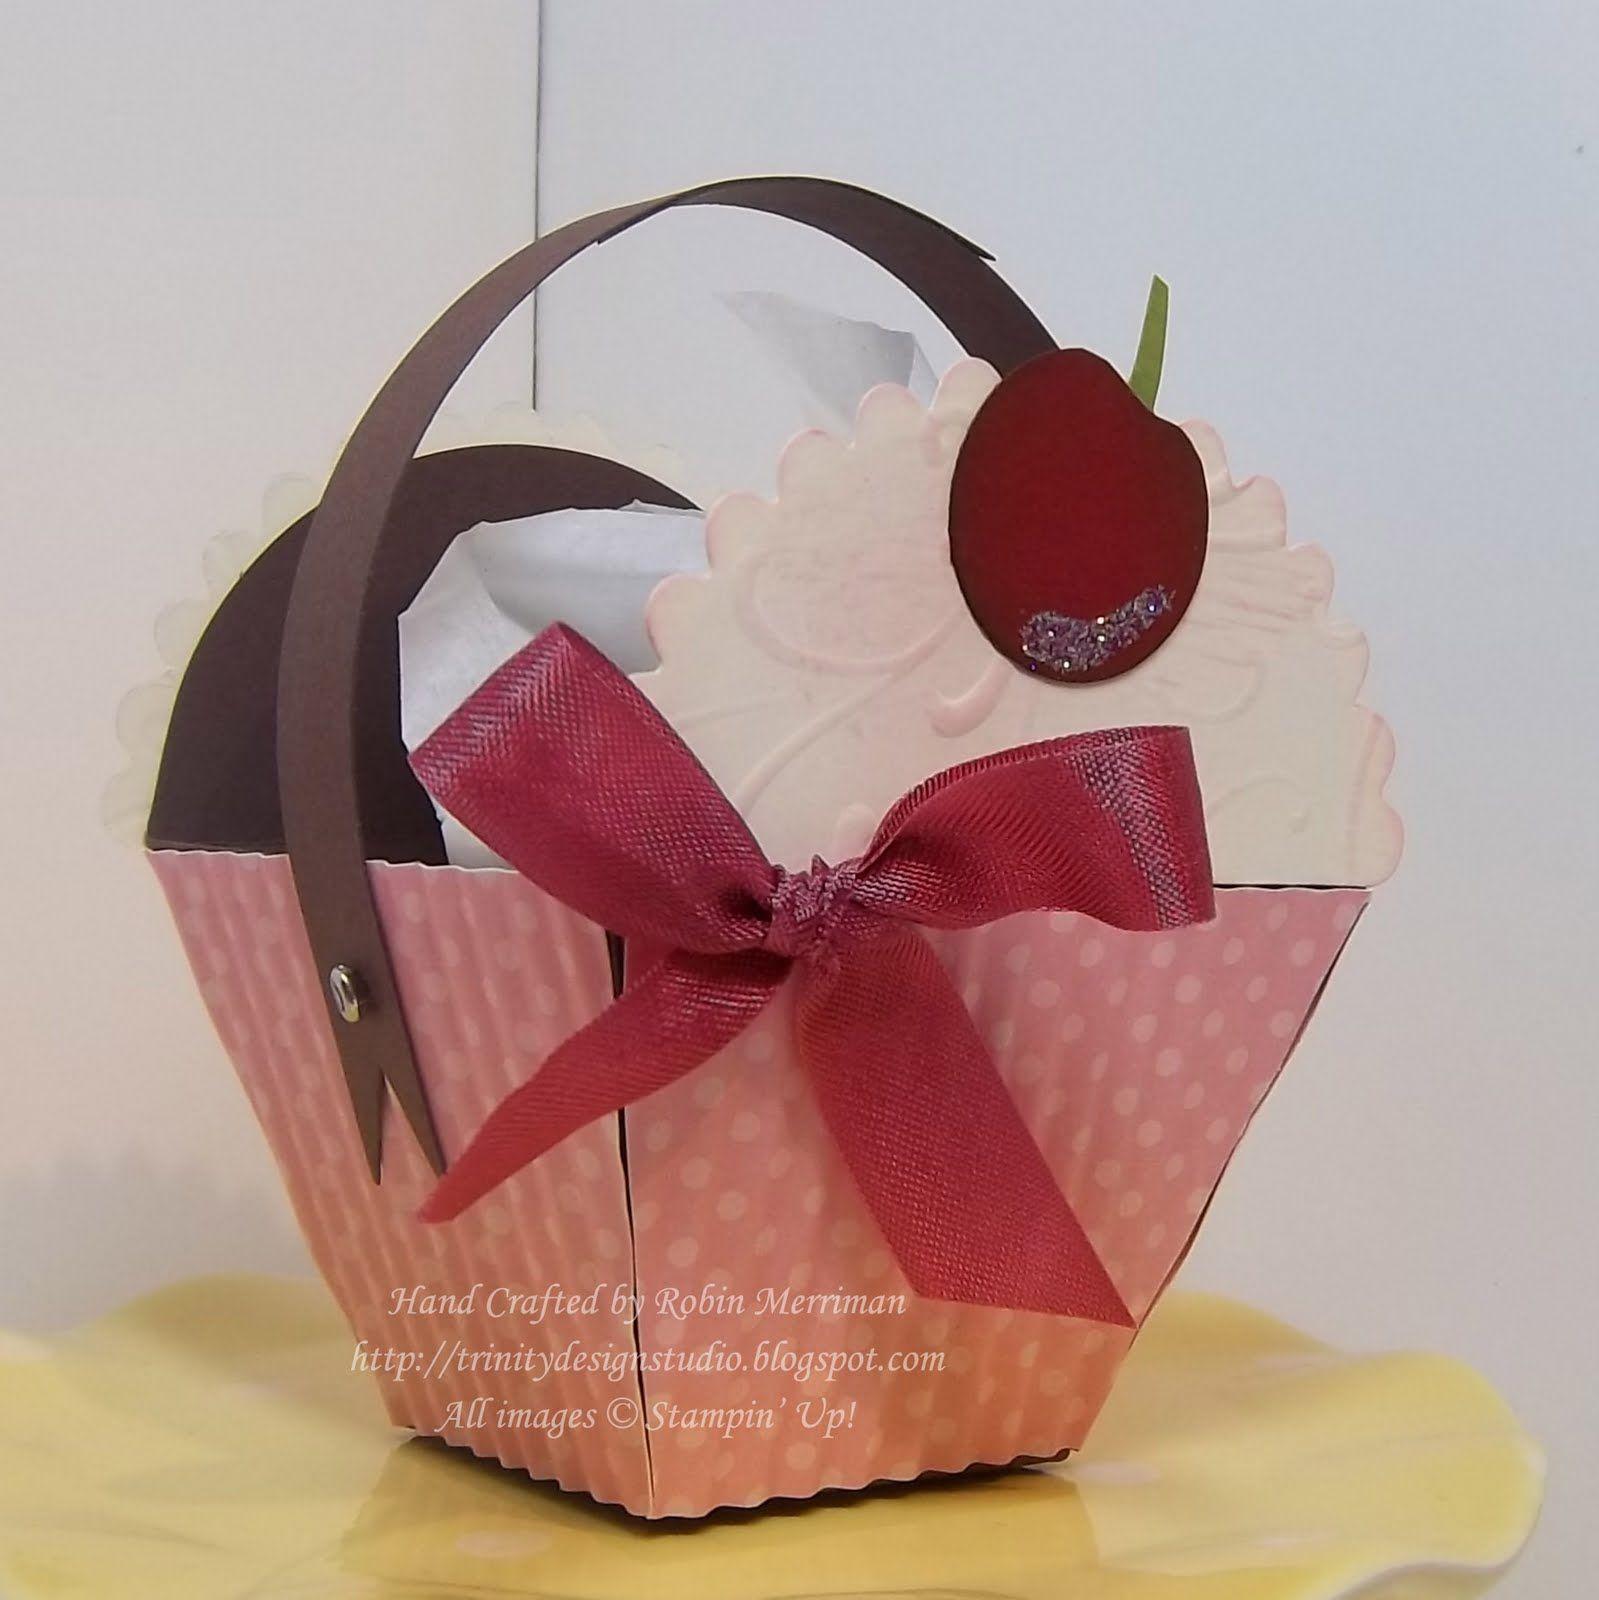 Cupcake basket tutorial using stampin ups petal cone die